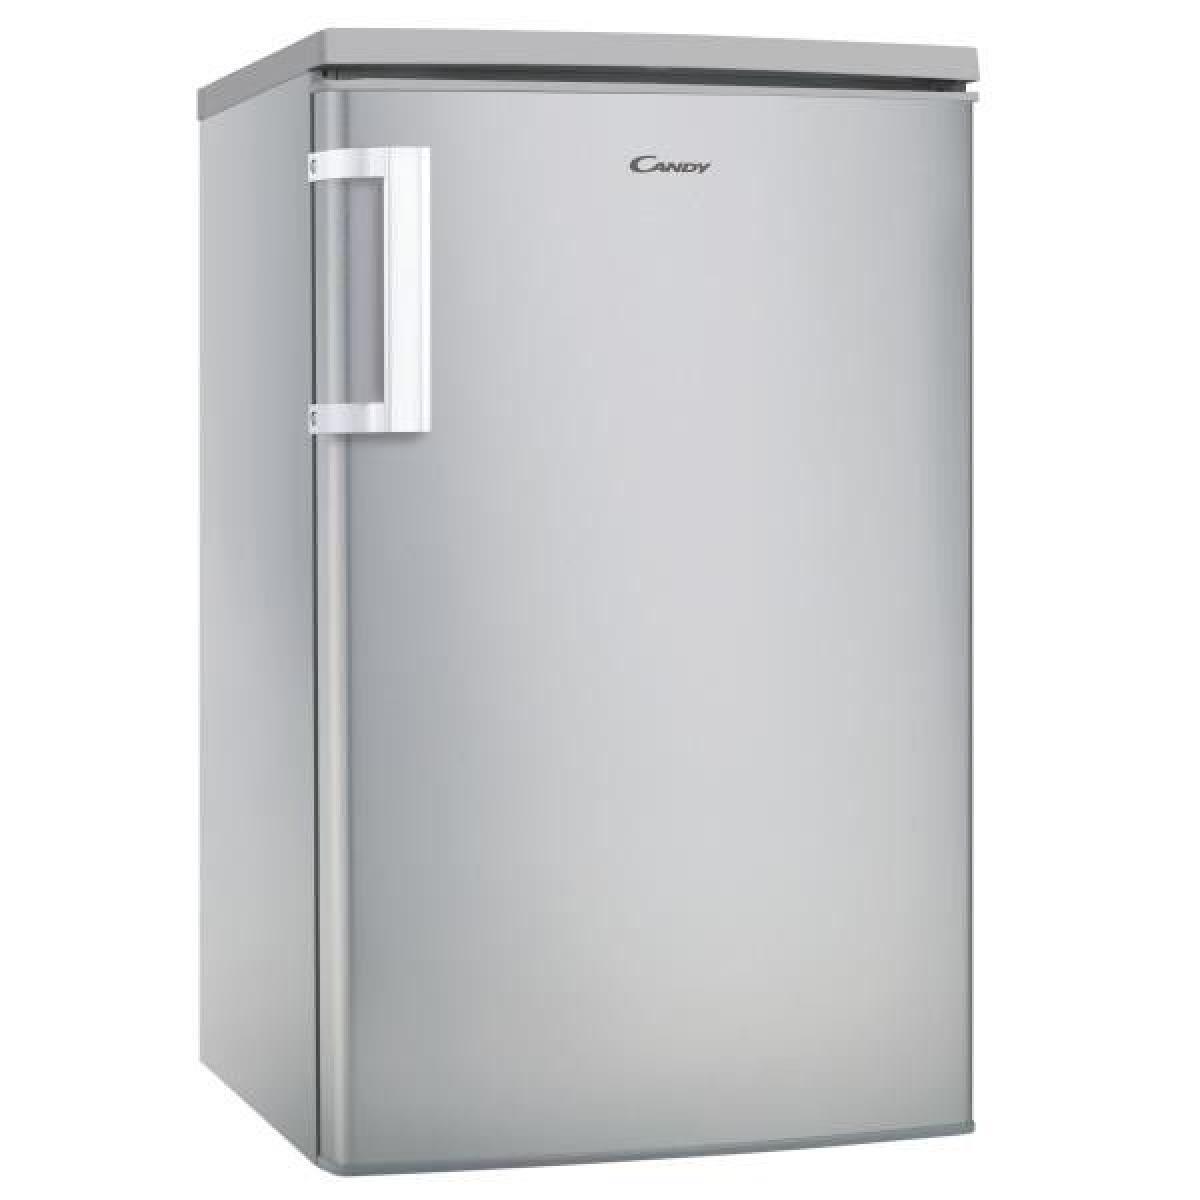 Candy Réfrigérateur table top 83L CANDY A++, CCTOS502SHN